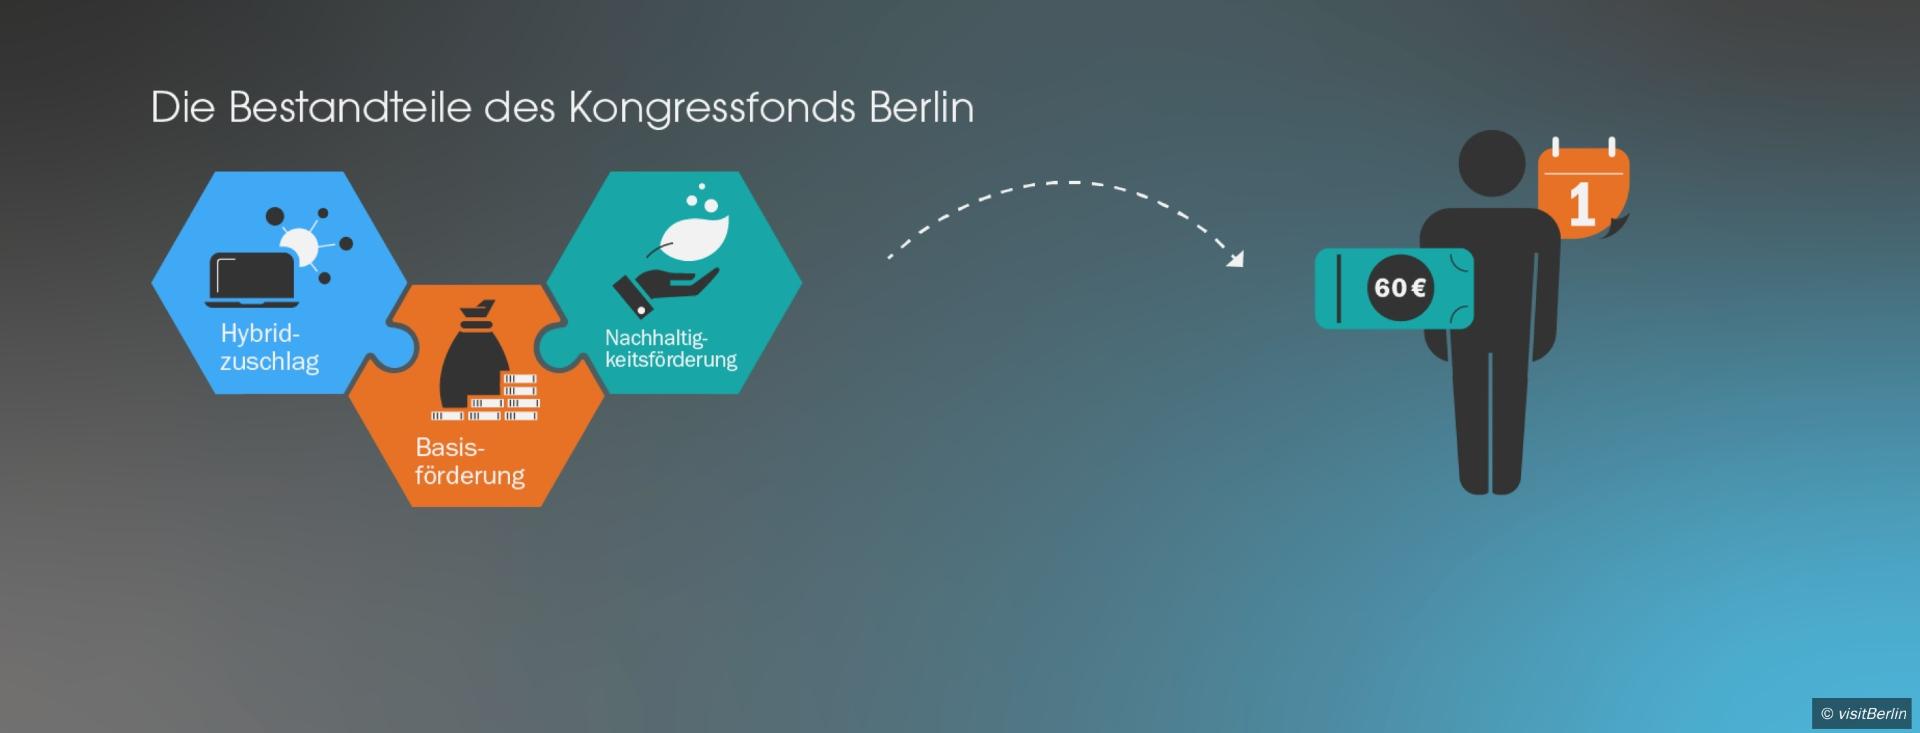 Kongressfonds Berlin